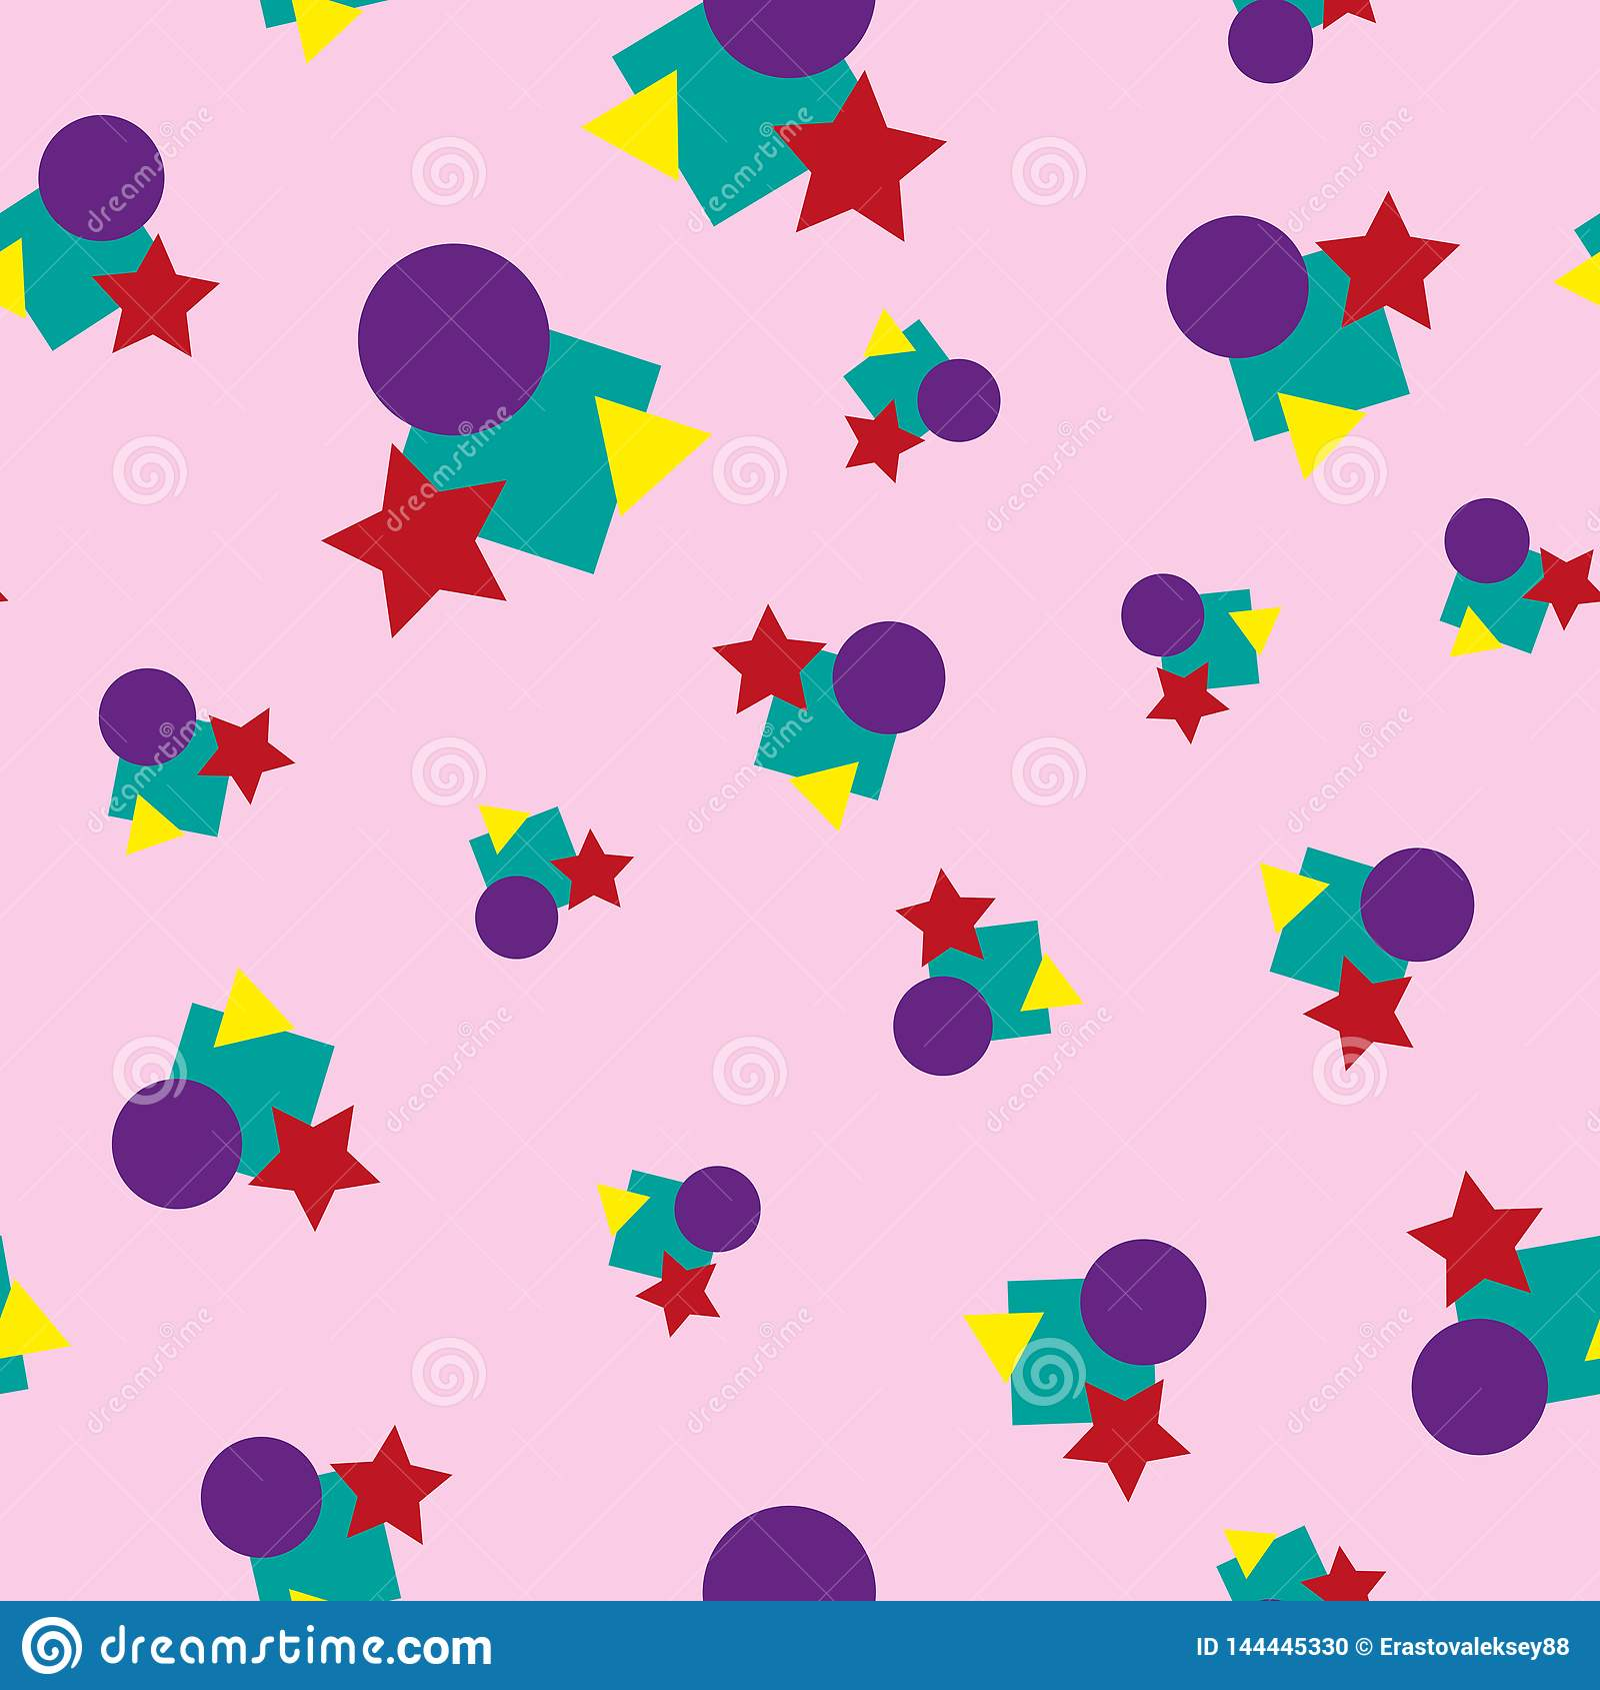 Children`s colorful geometric seamless pattern. Colour vector illustration.